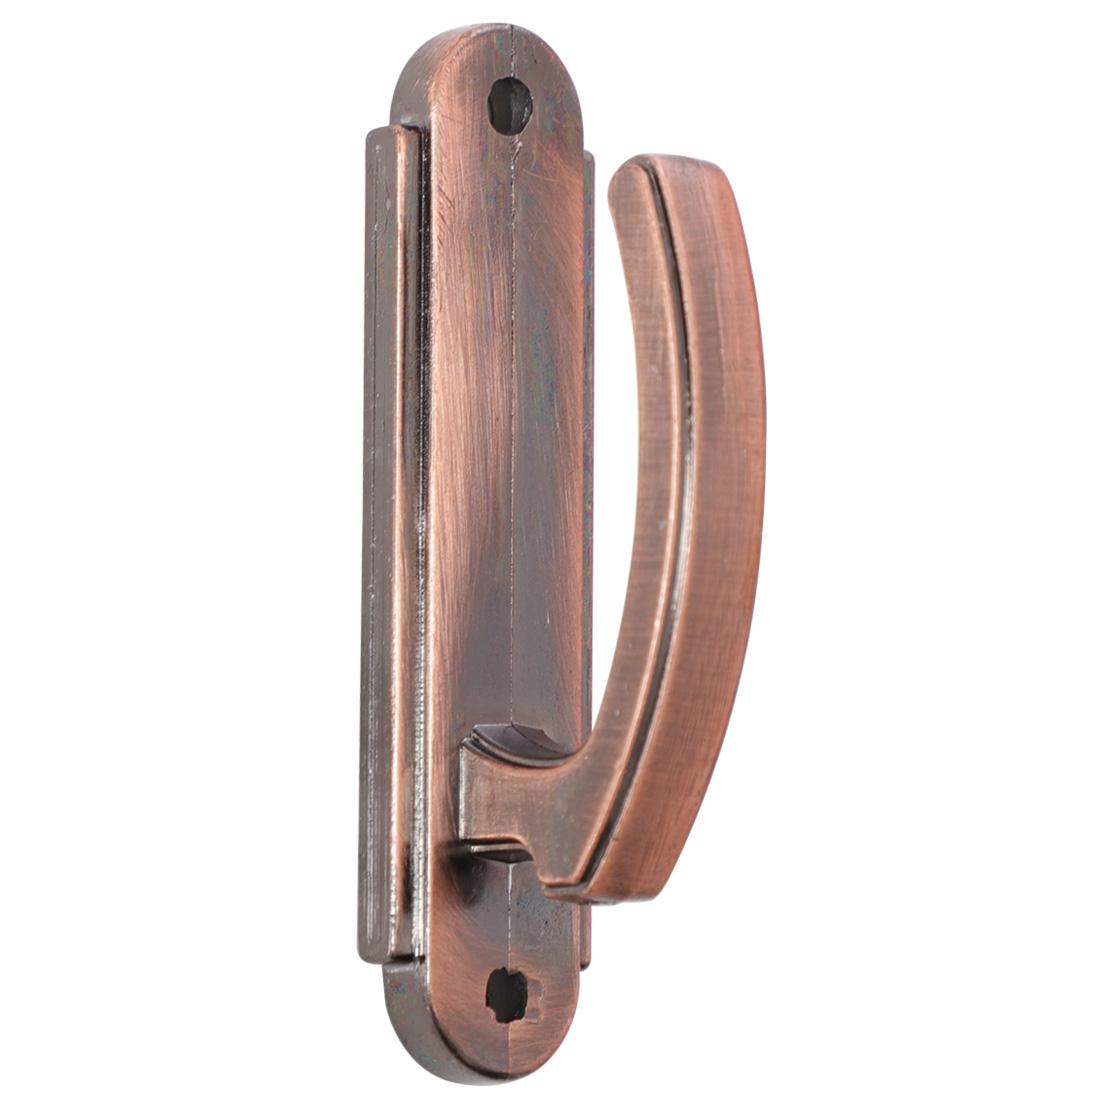 Curtain Tieback Hooks, Zinc Alloy Holdback Screen Holder Hanger, Copper Tone